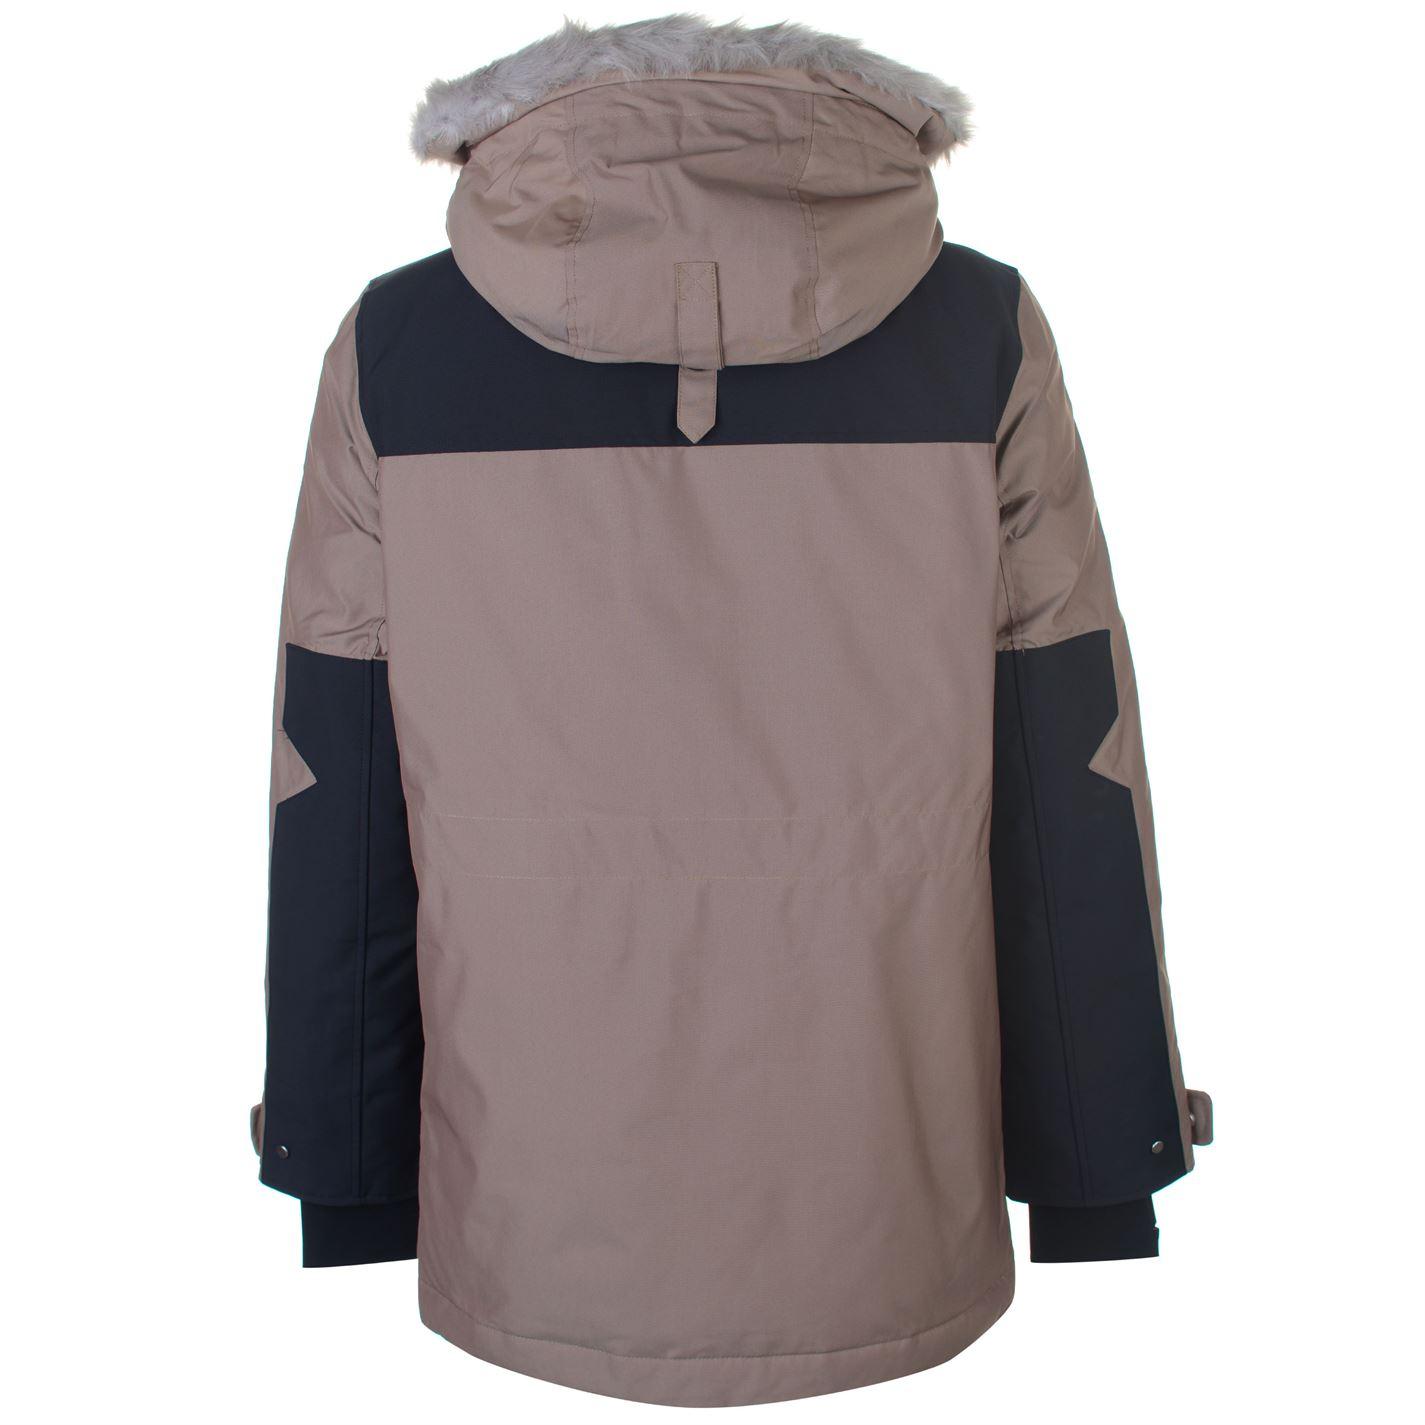 956e9f2851 Mens-Lacoste-Live-Parka-Jacket-Hooded-New thumbnail 7